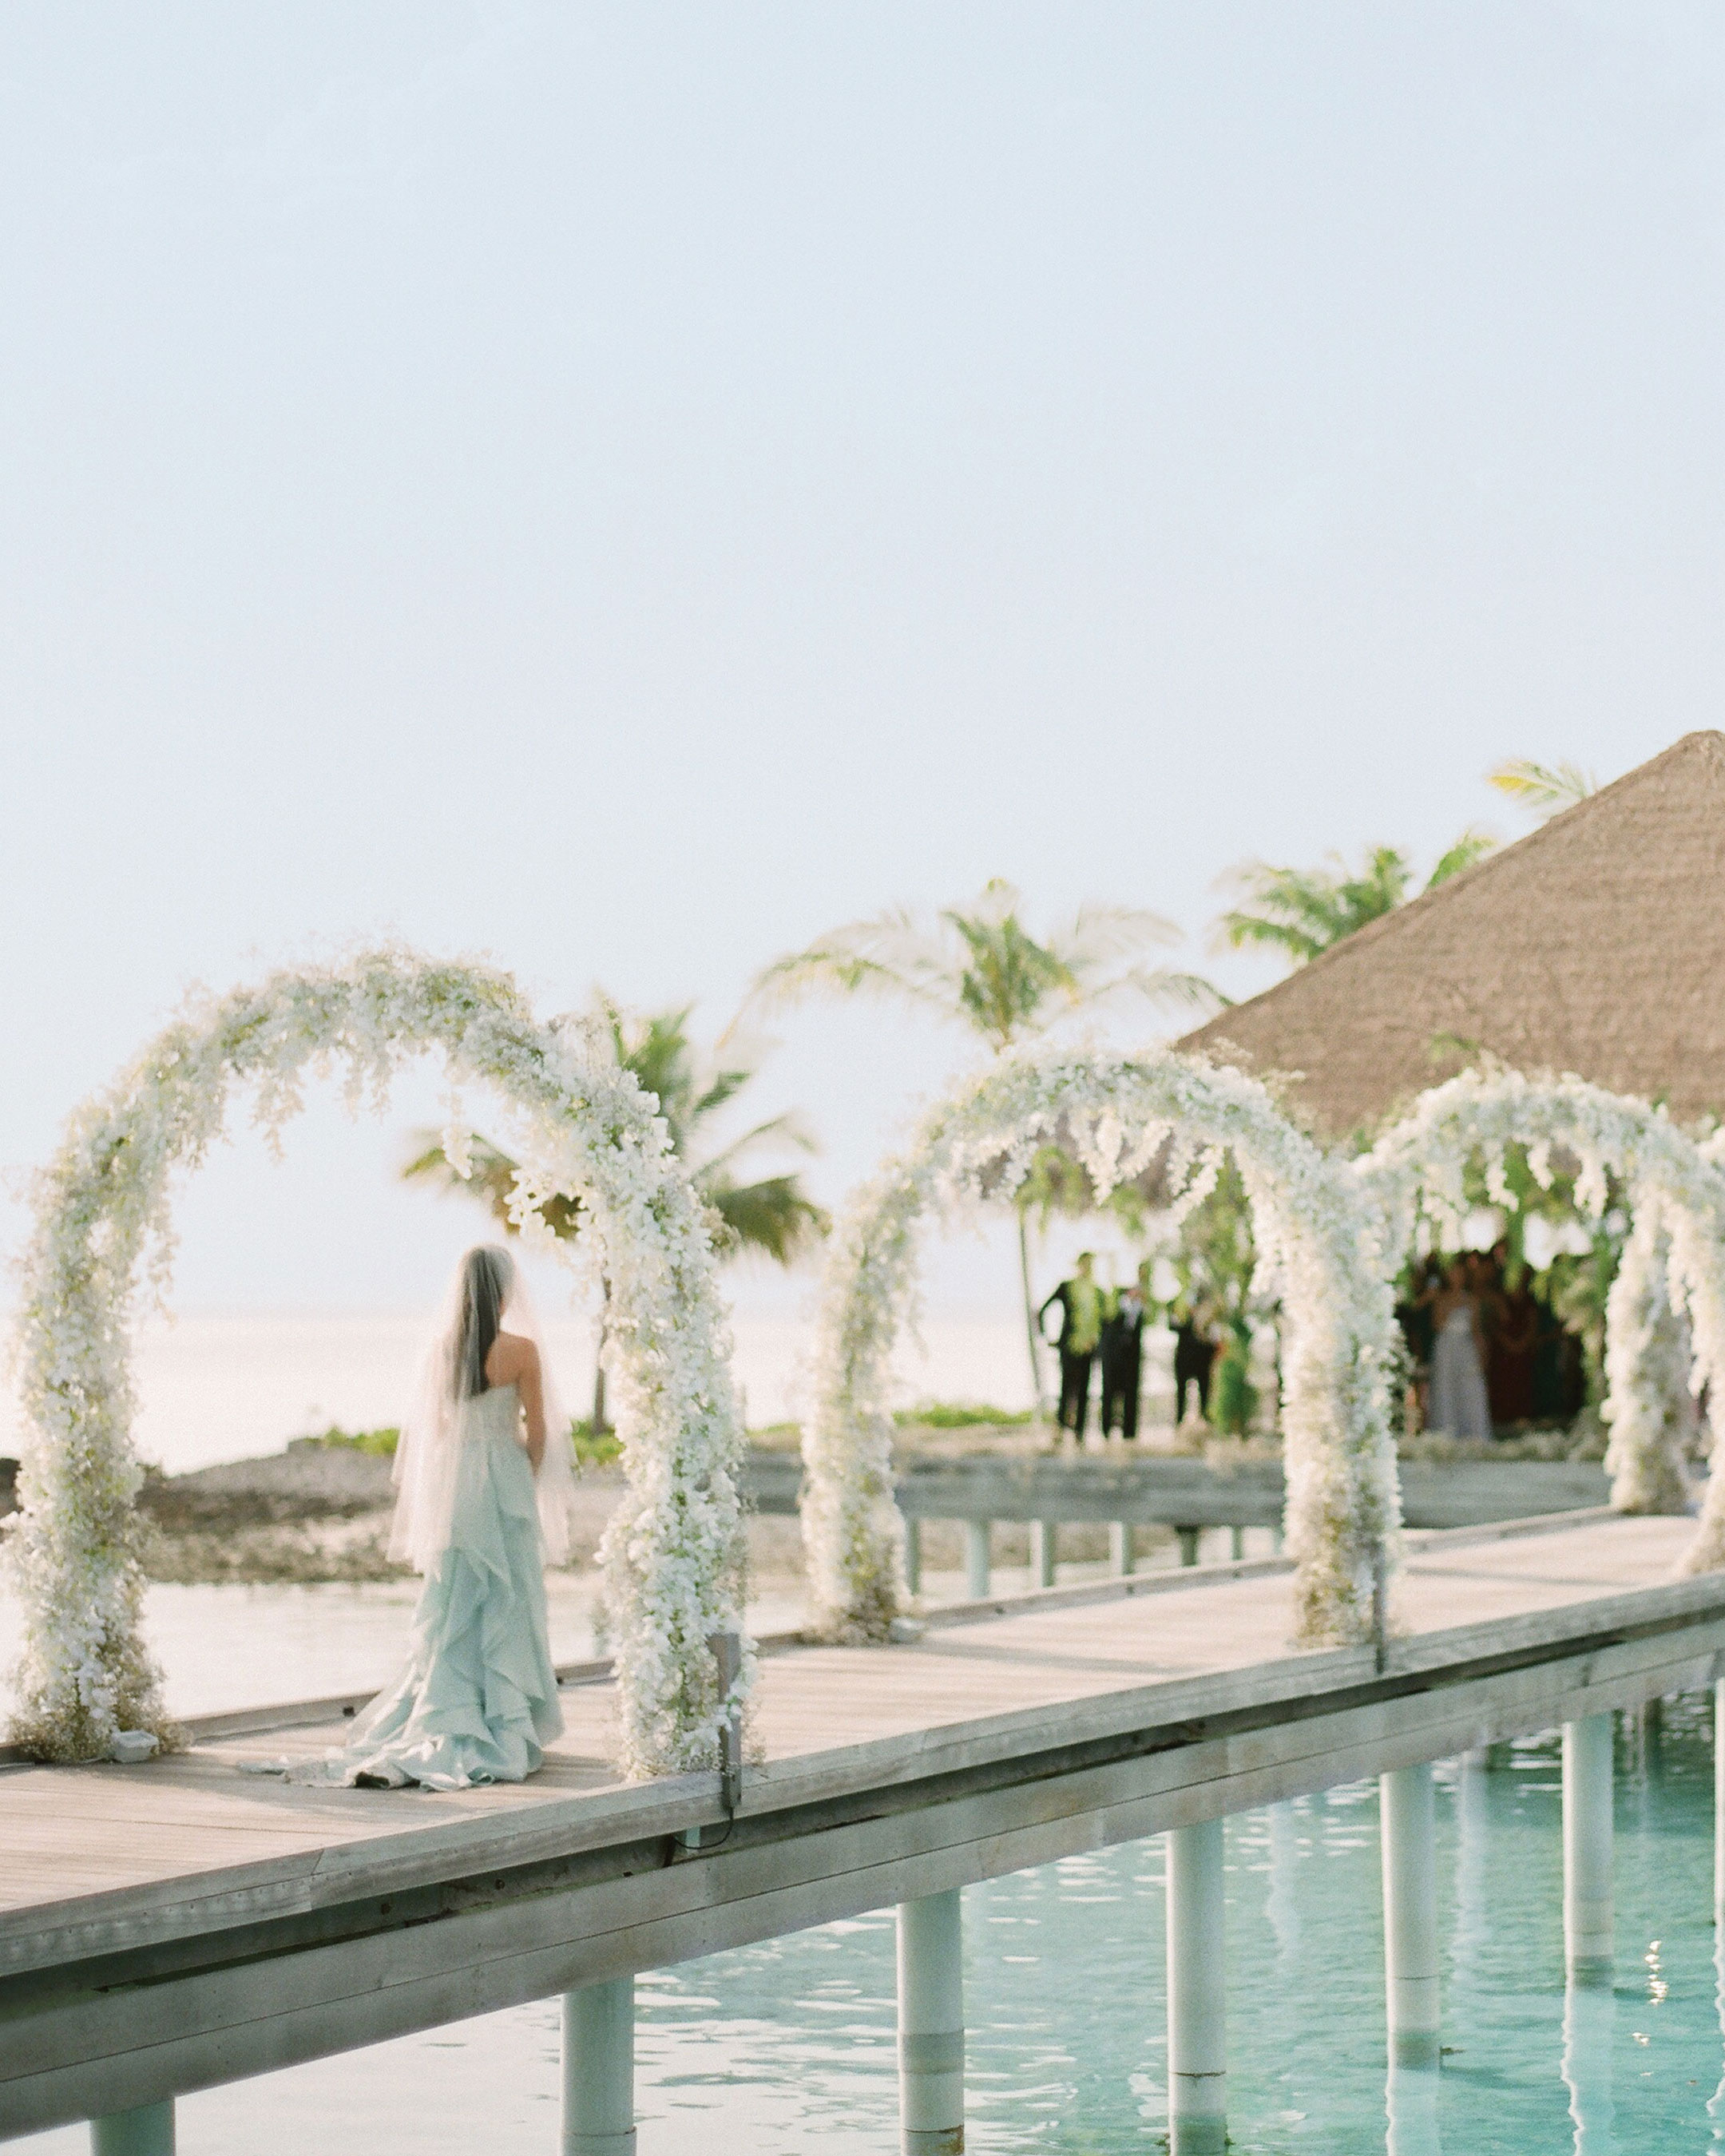 peony-richard-wedding-maldives-archway-1471-s112383.jpg